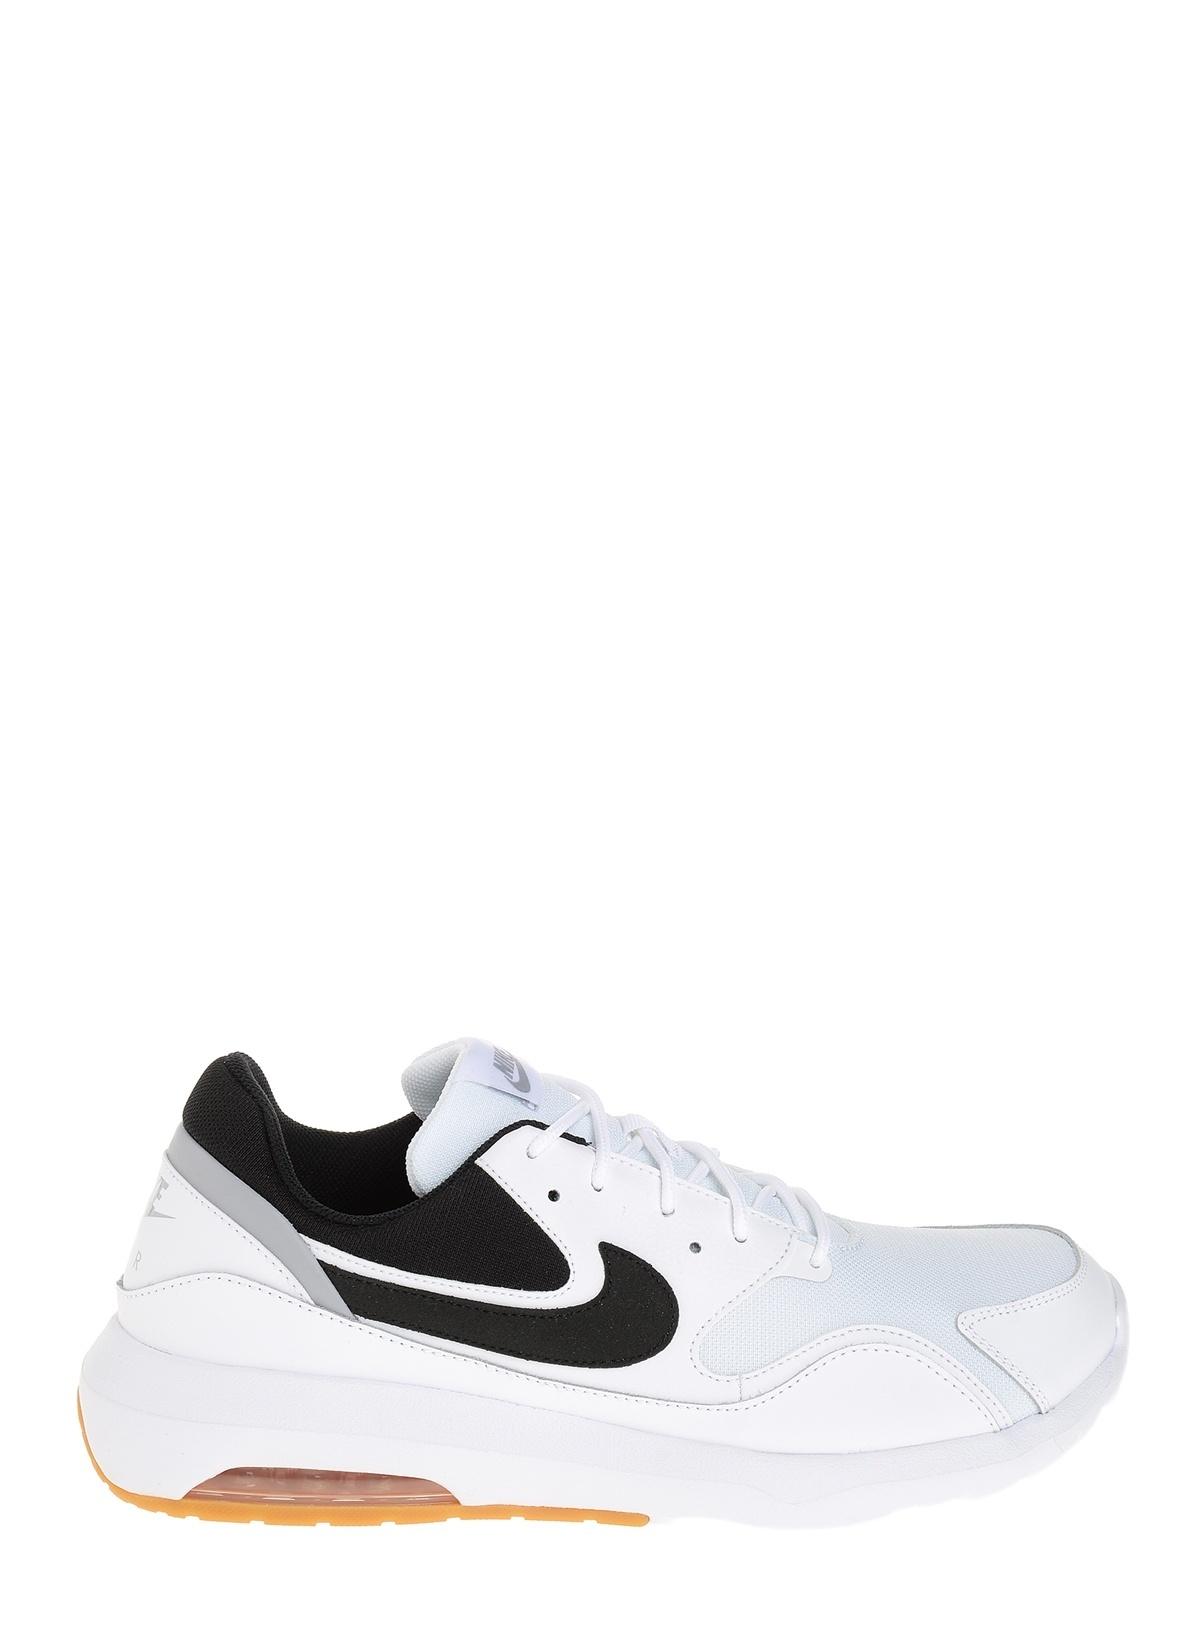 527b2668cb6 Nike Erkek Air Max Nostalgic White Black-Wolf Grey-Gum Ligh ...